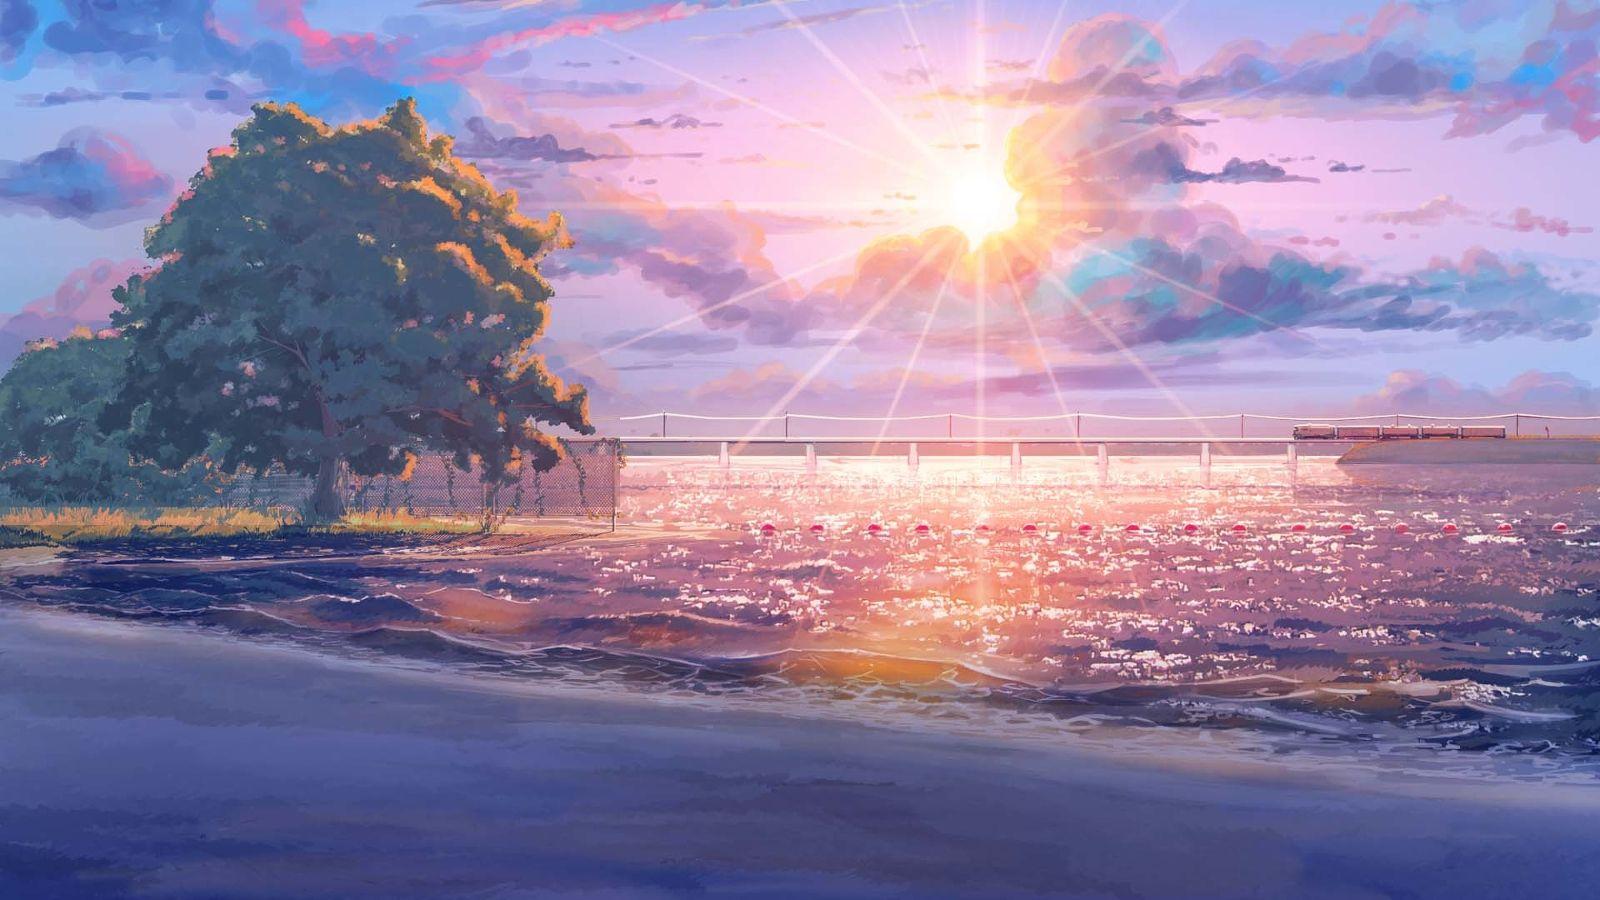 Nature Anime Scenery Background Wallpaper Cenário anime